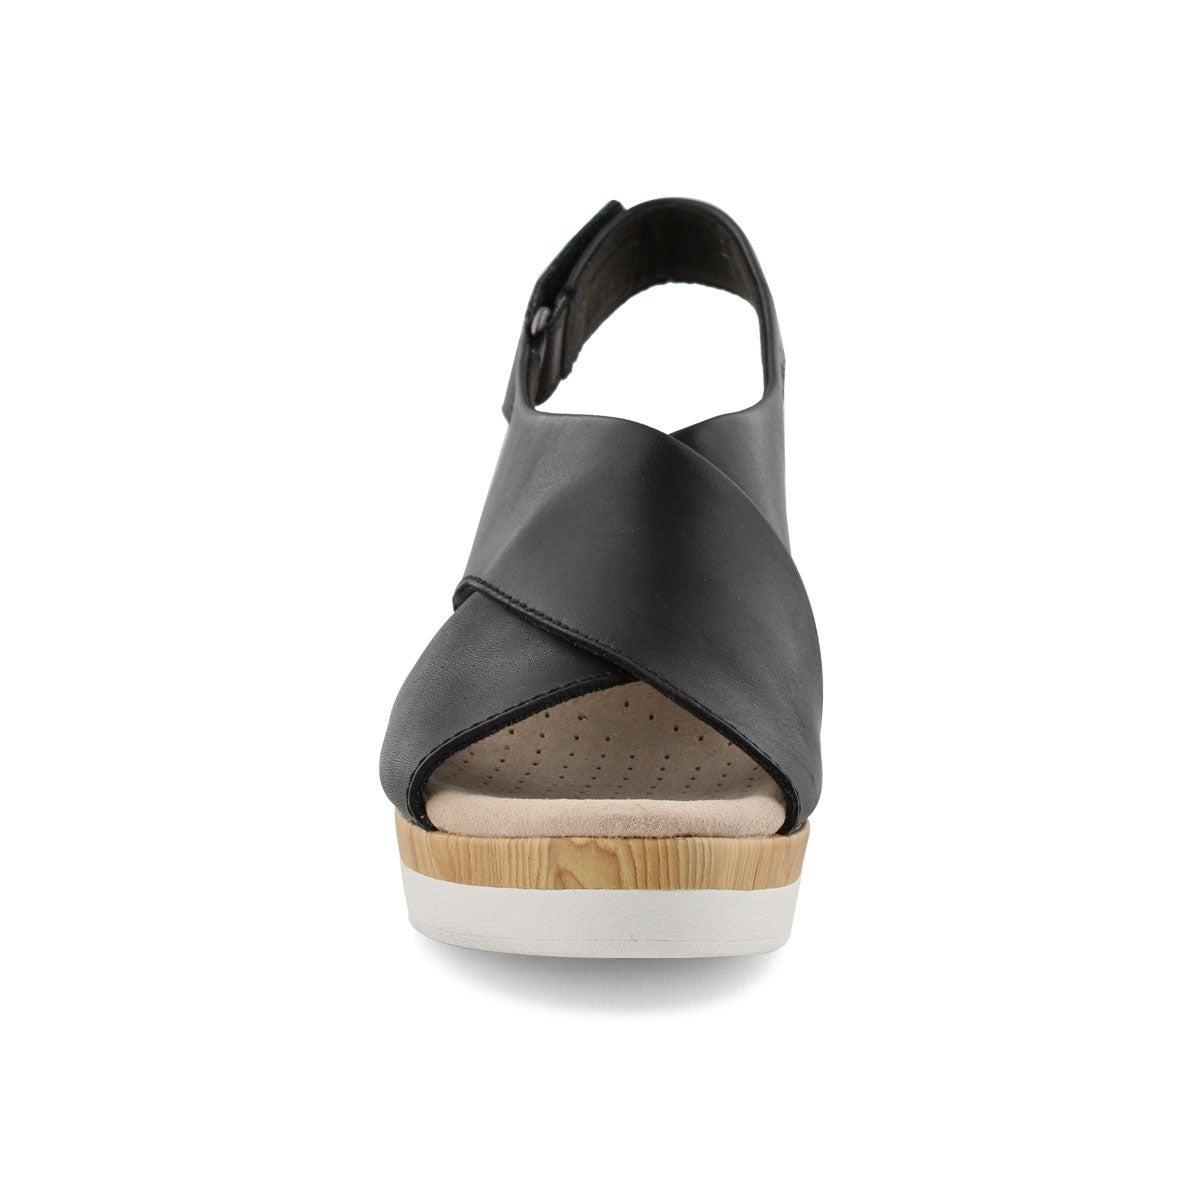 Lds Cammy Pearl black wedge sandal